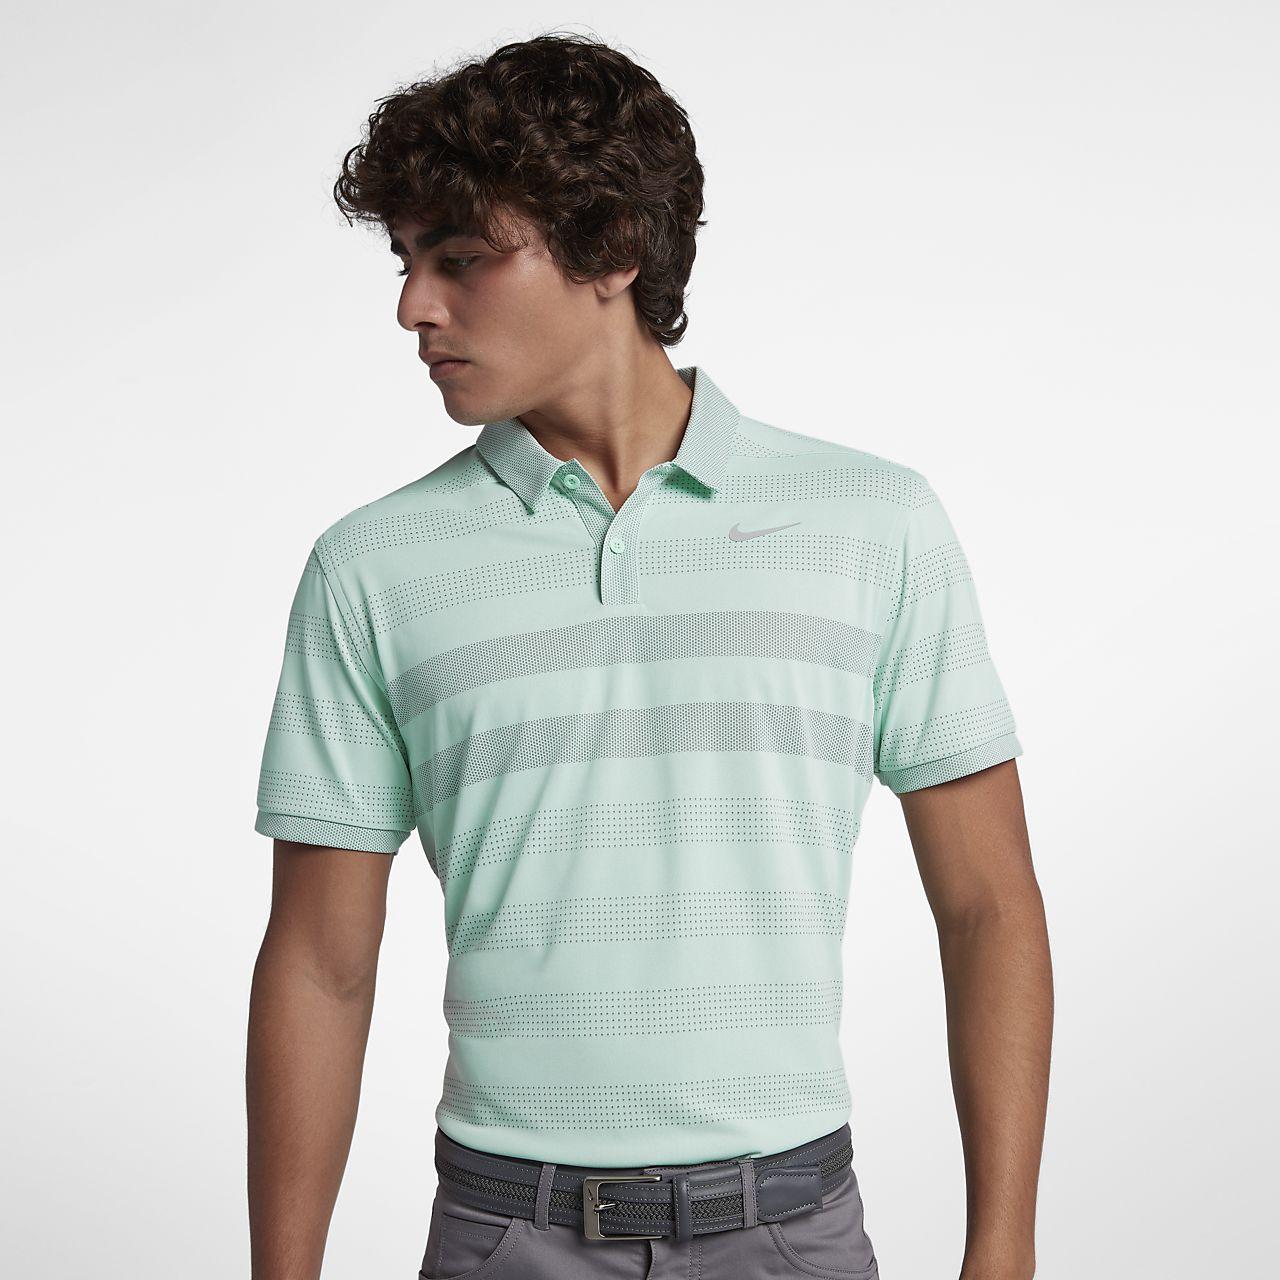 Nike Zonal Cooling Çizgili Erkek Golf Polo Üst